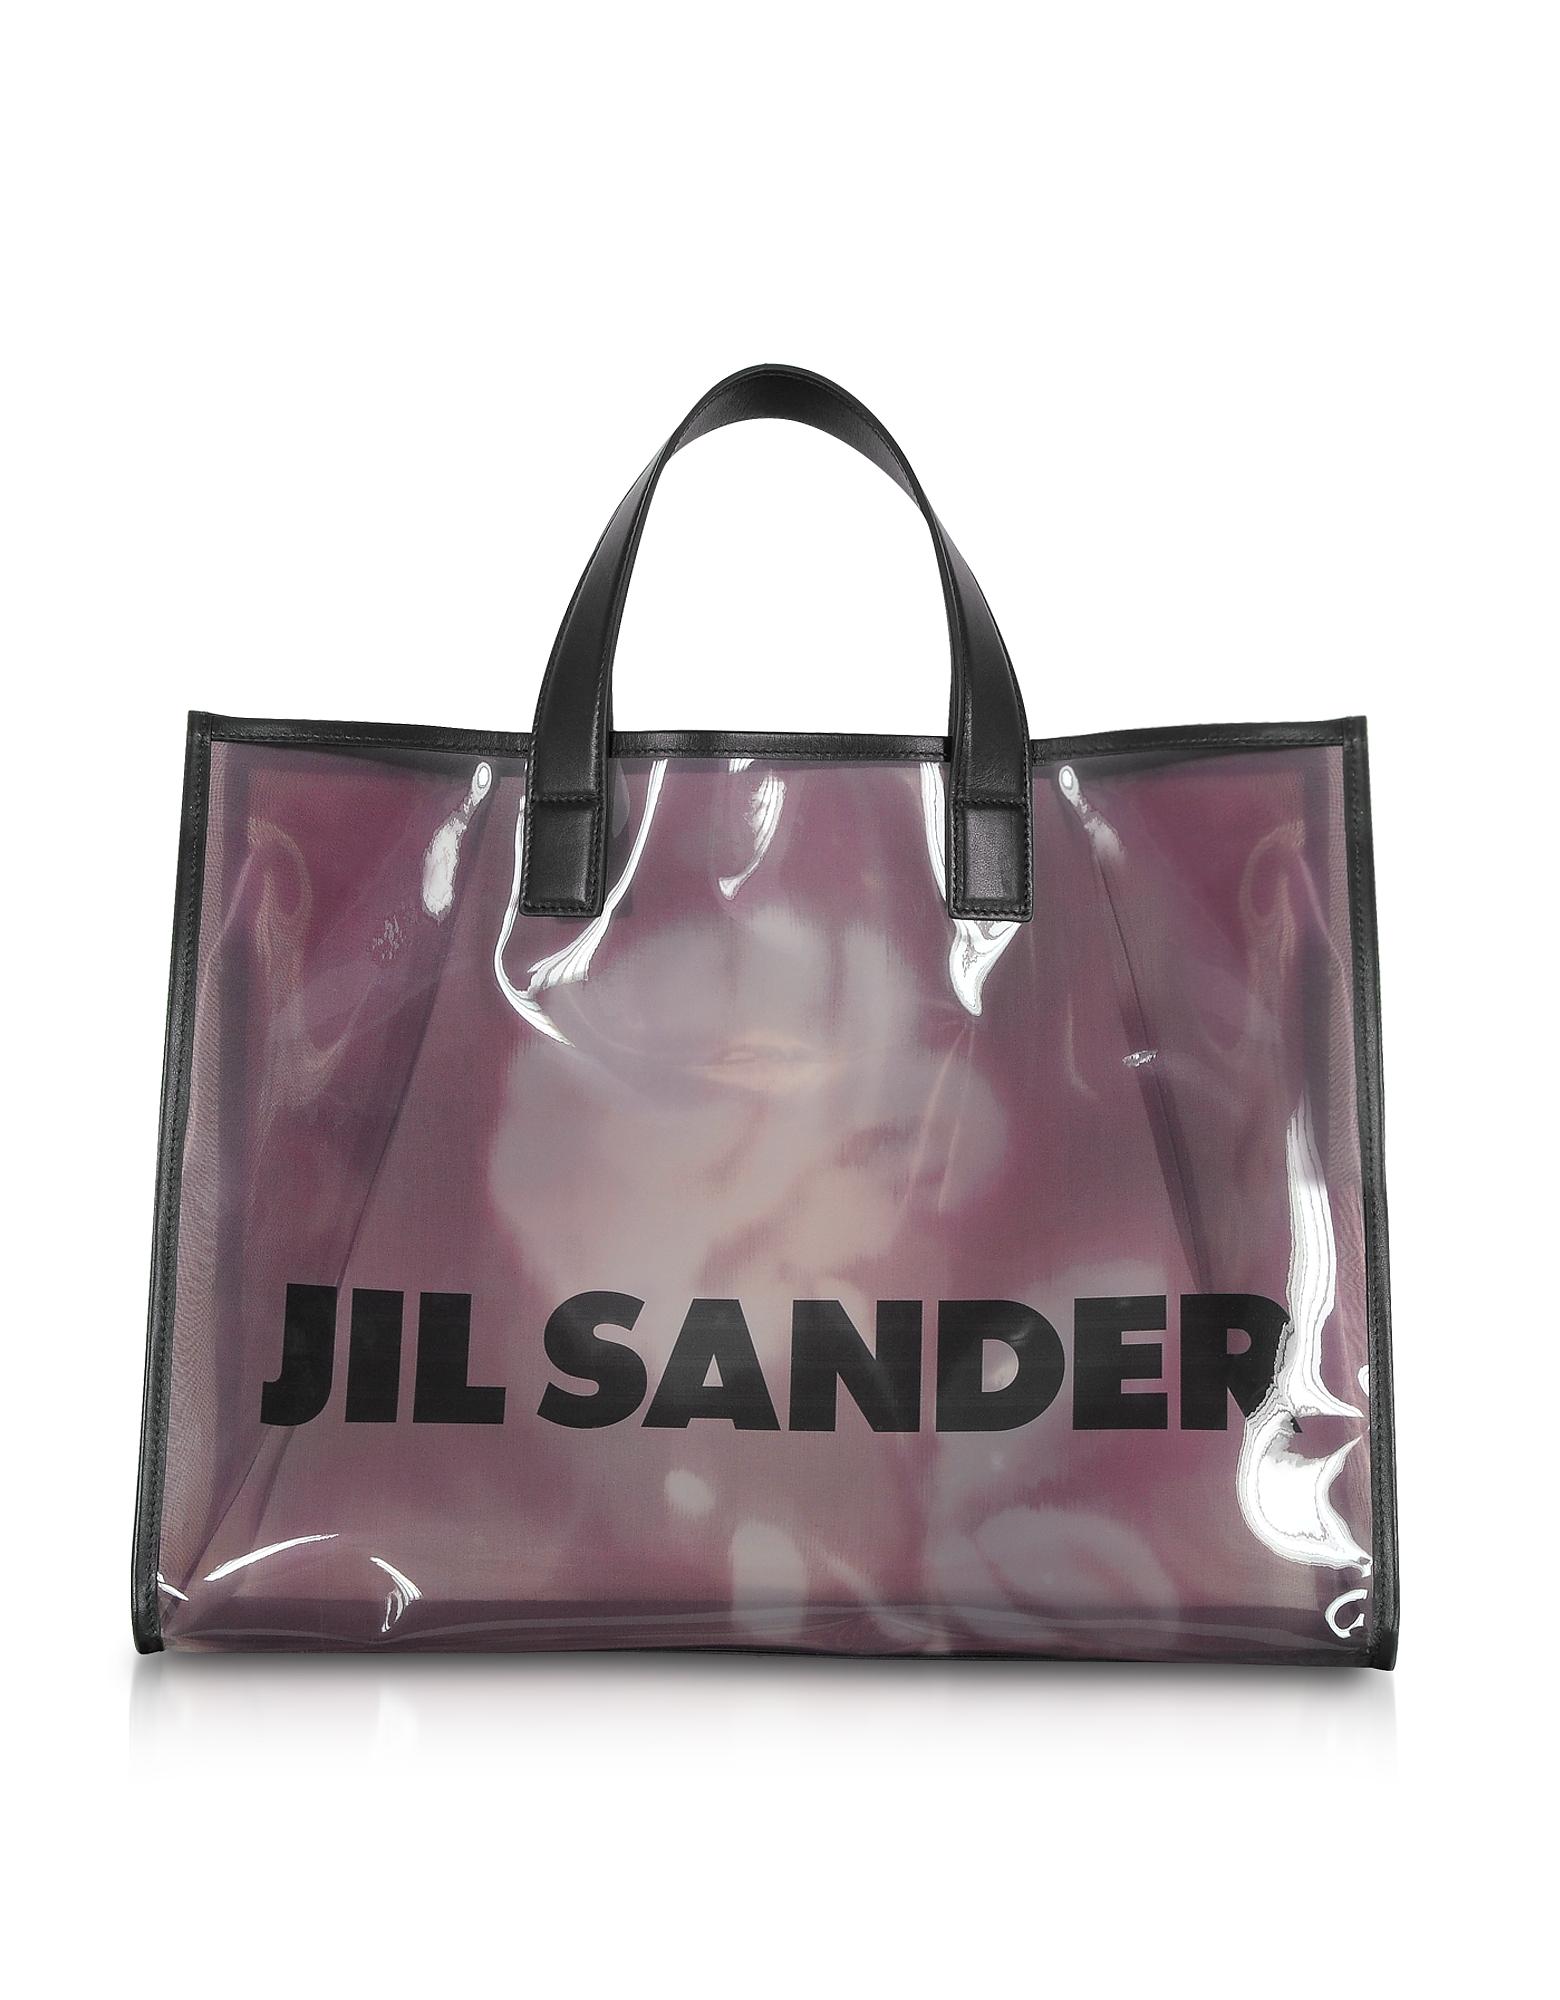 Image of Jil Sander Designer Handbags, See-through Medium Vinyl Tote bag